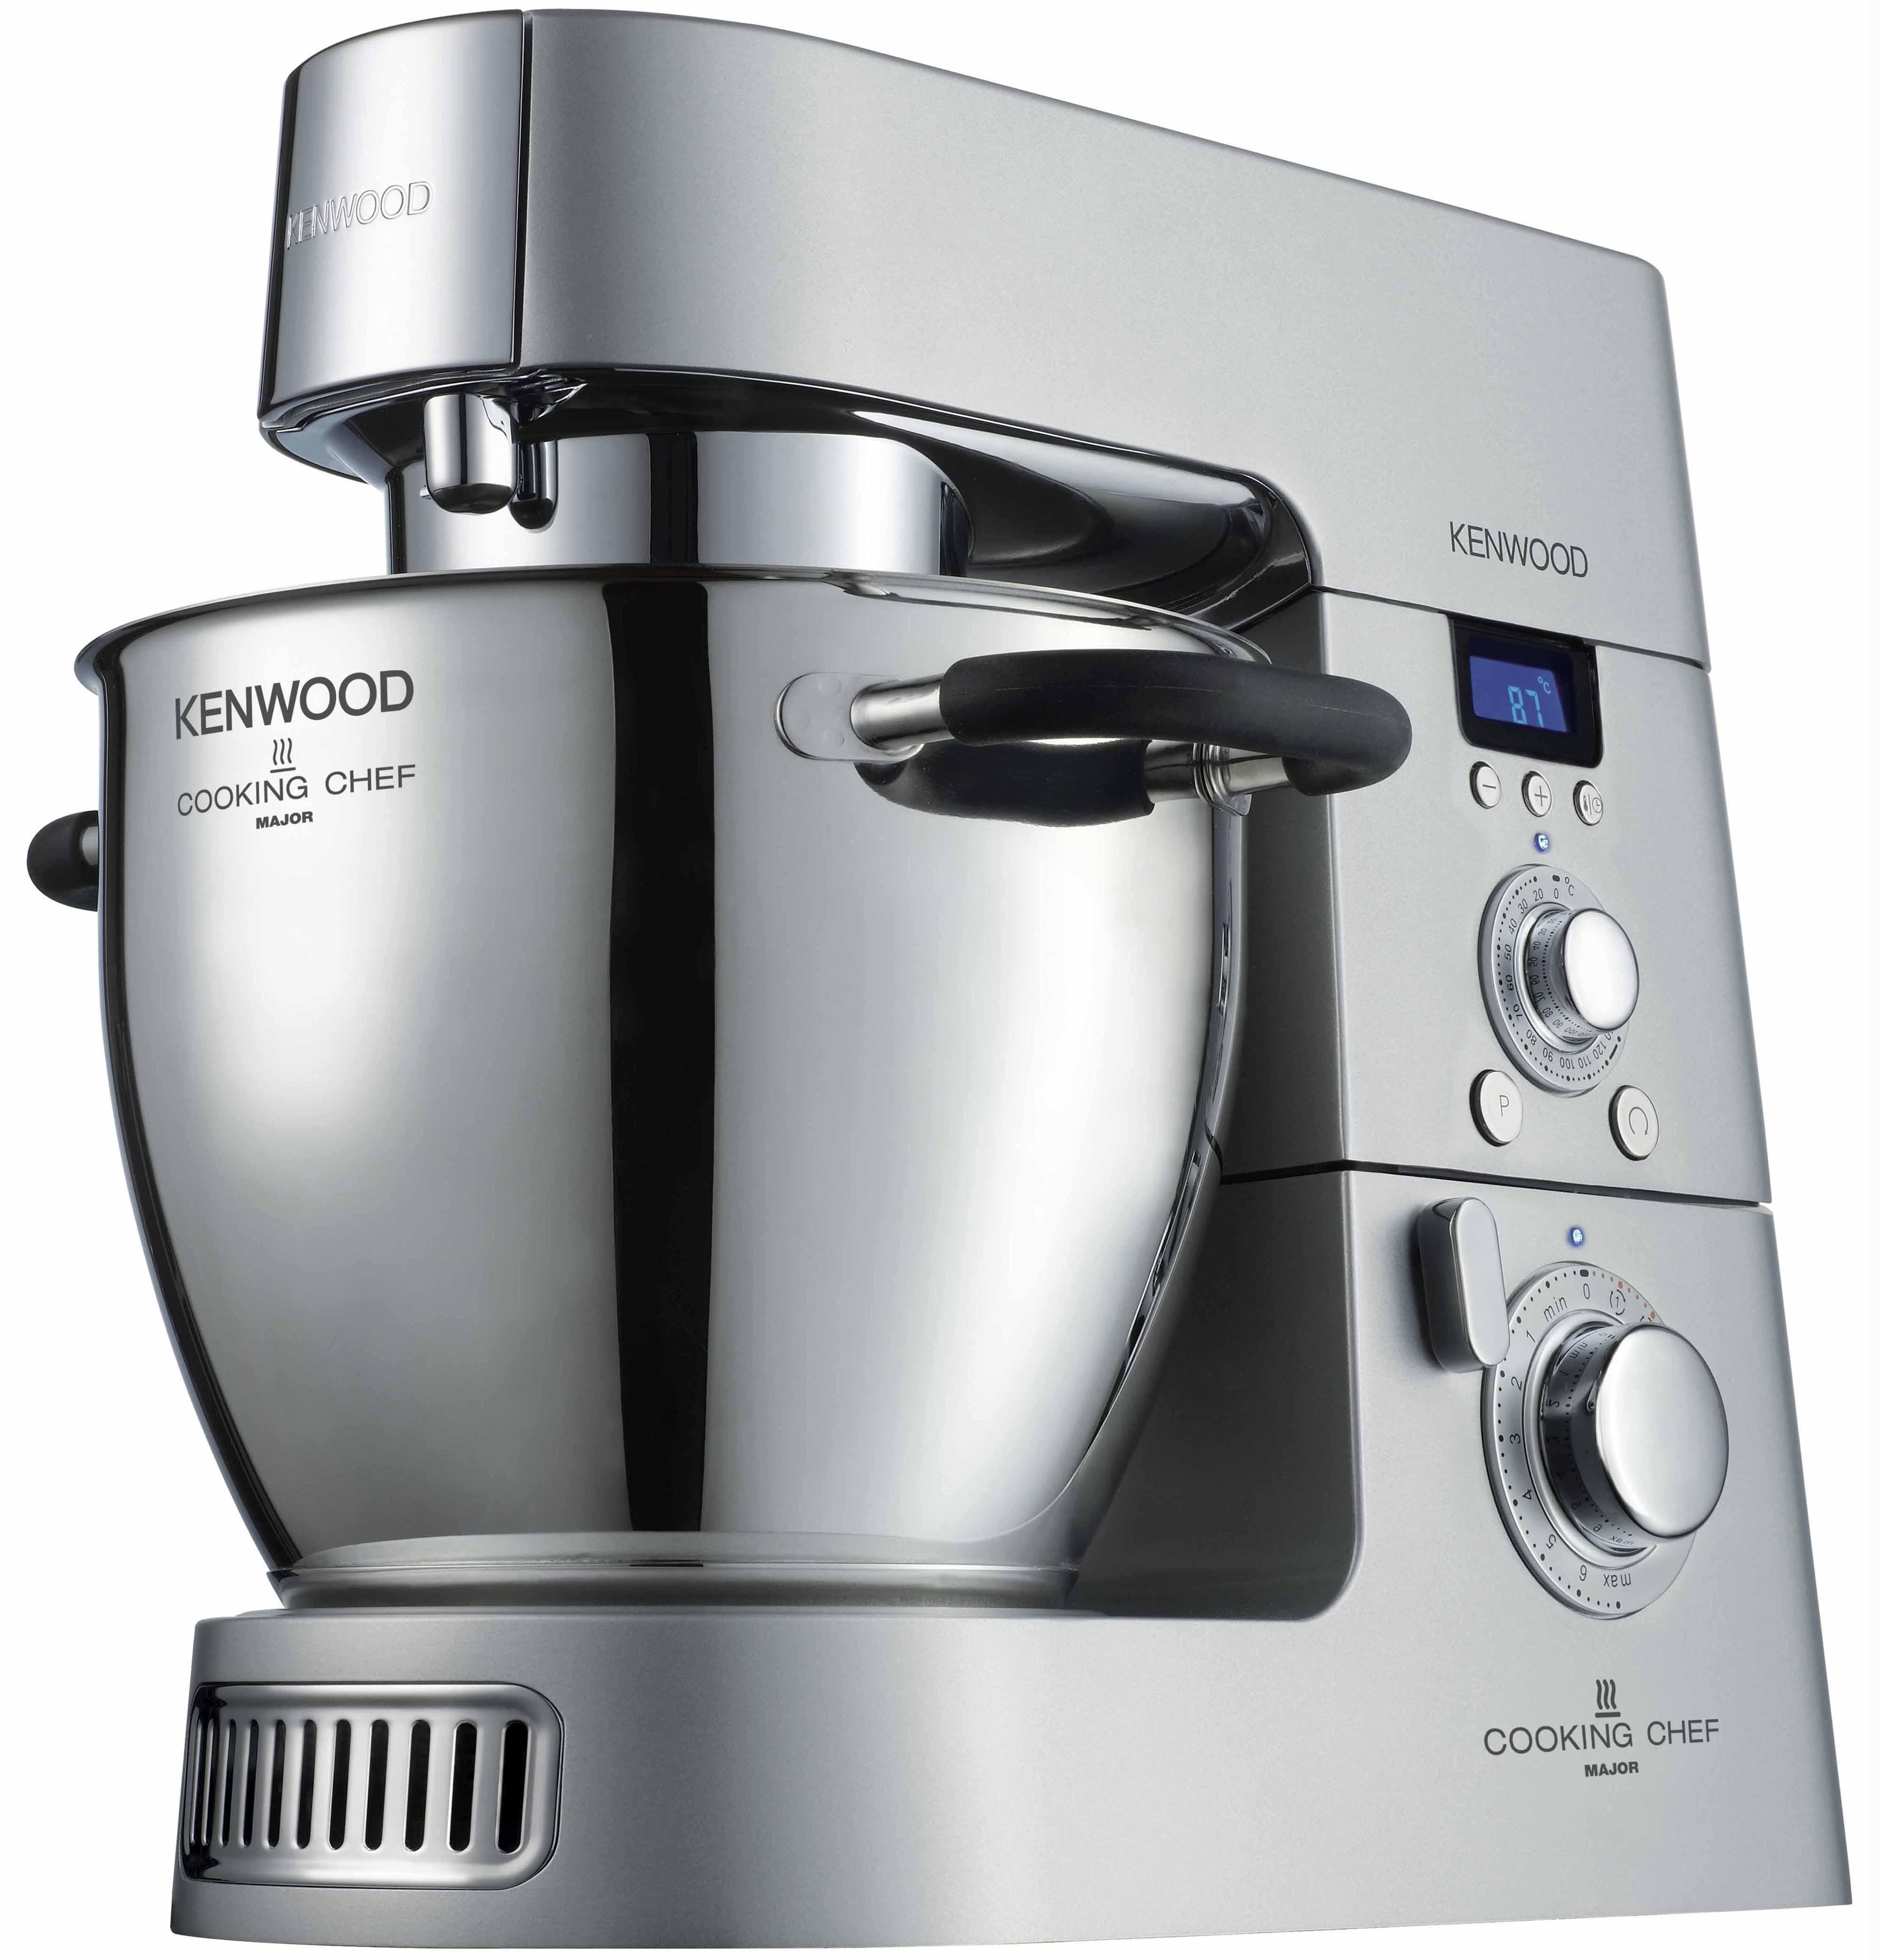 Kenwood Cooking Chef KM070 – Robot da Cucina